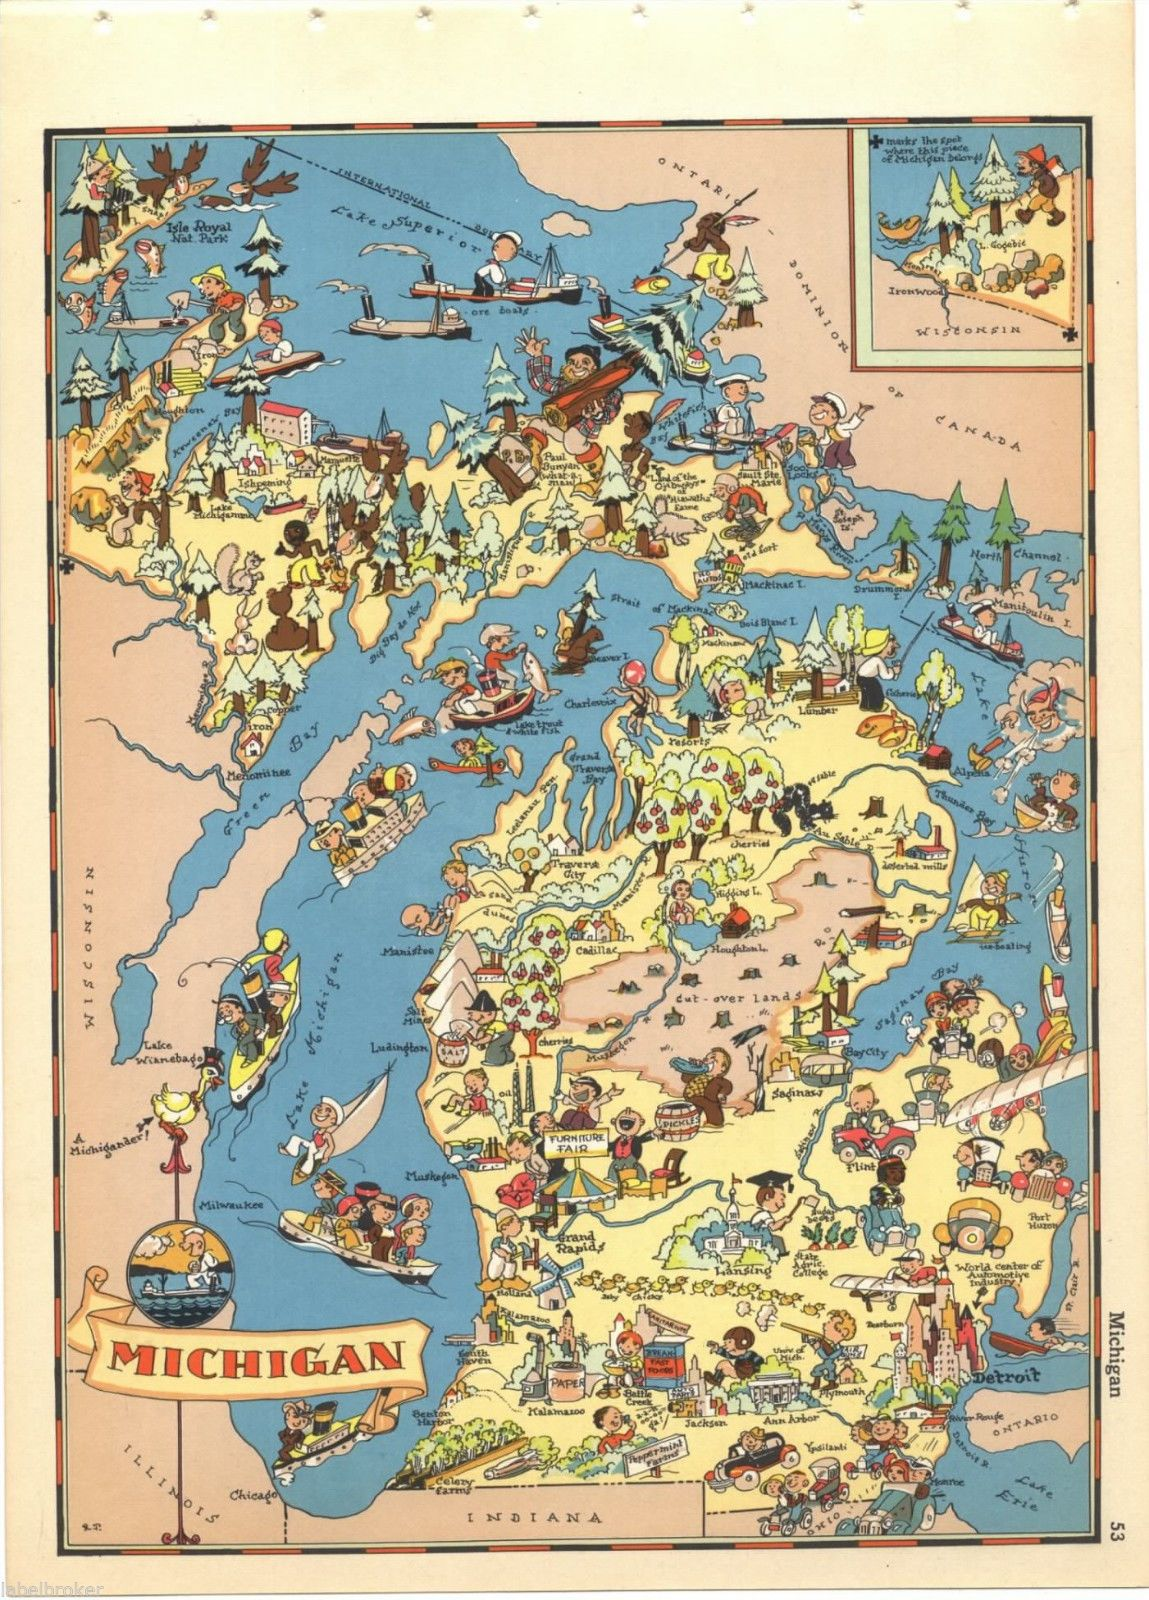 Ruth taylor vintage michigan map original cartoon rare pictorial ruth taylor vintage michigan map original cartoon rare pictorial cartograph ebay gumiabroncs Gallery